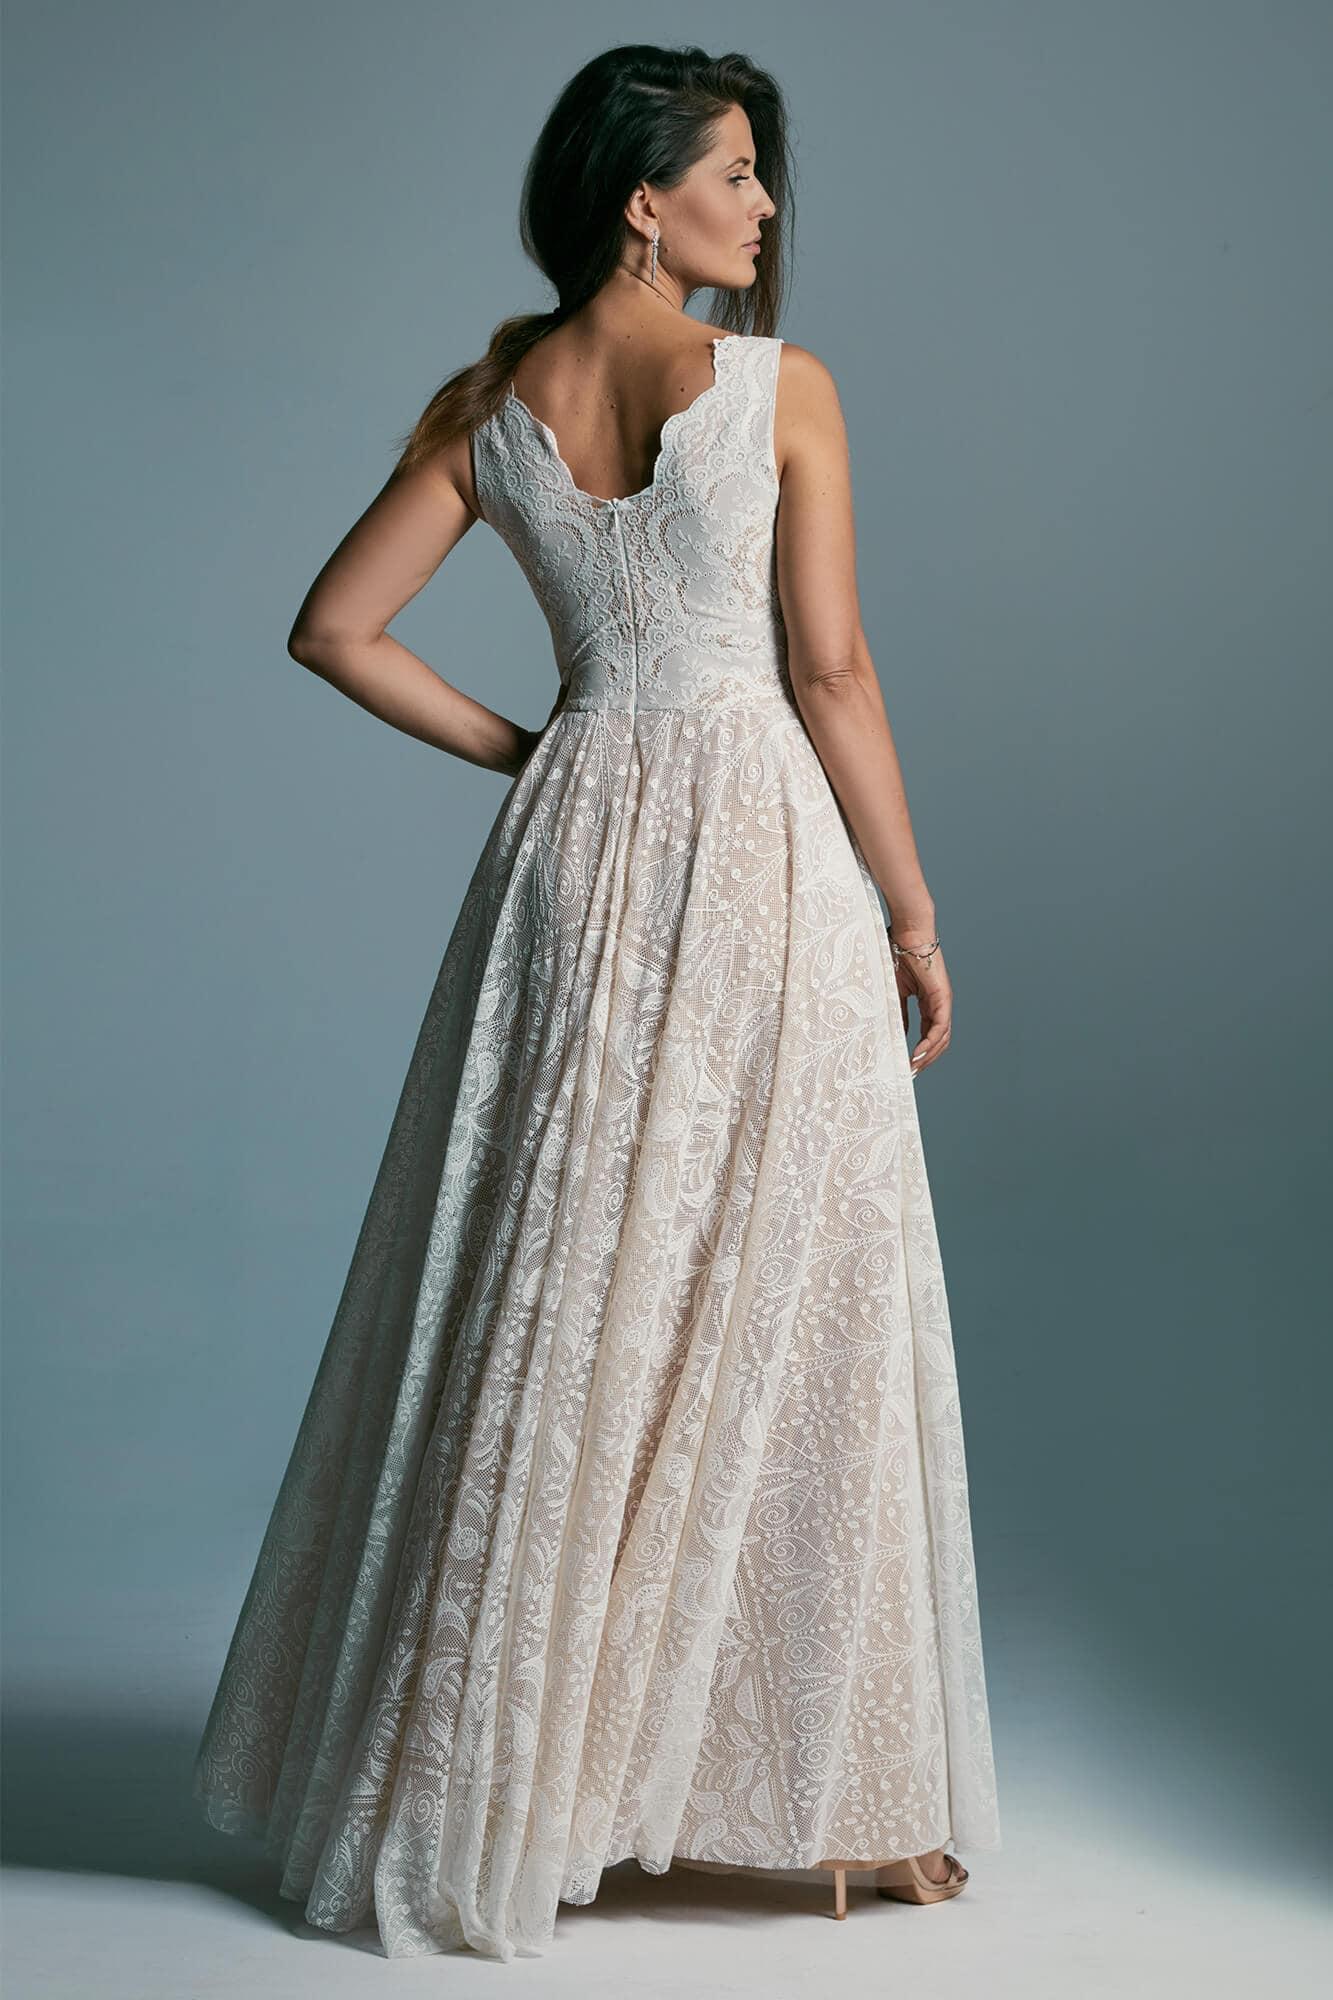 Elegant, classic wedding dress ideal for any figure. Porto 52